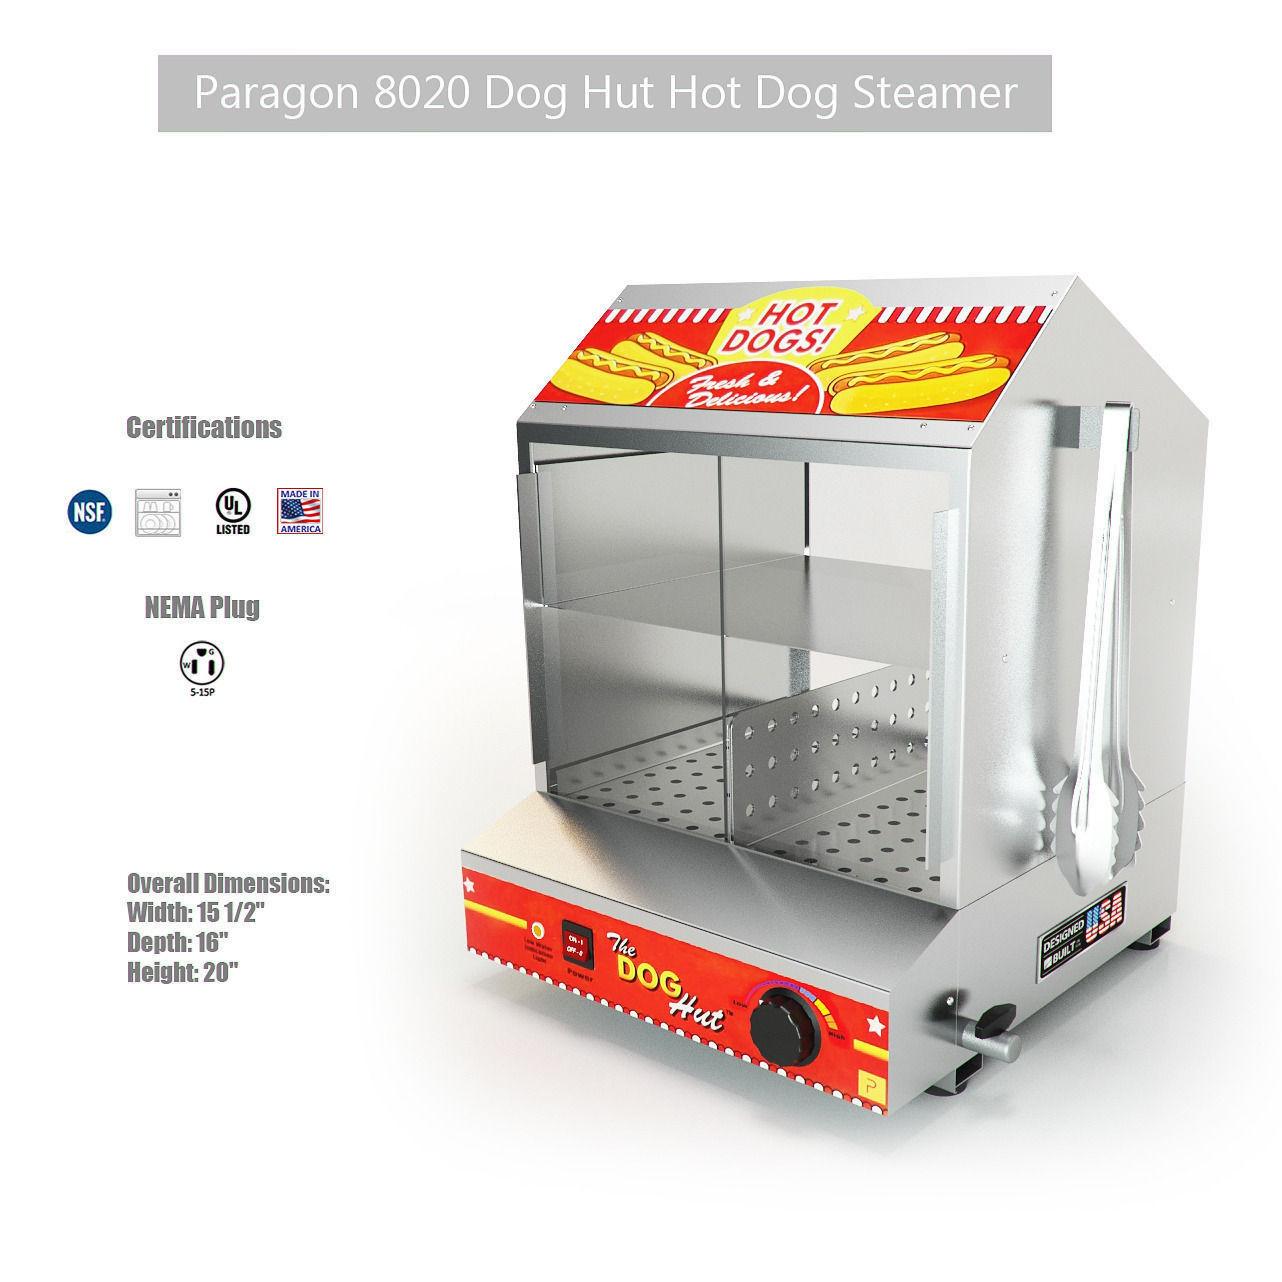 paragon dog hut hot dog steamer 3d model max fbx 1 - Hot Dog Warmer